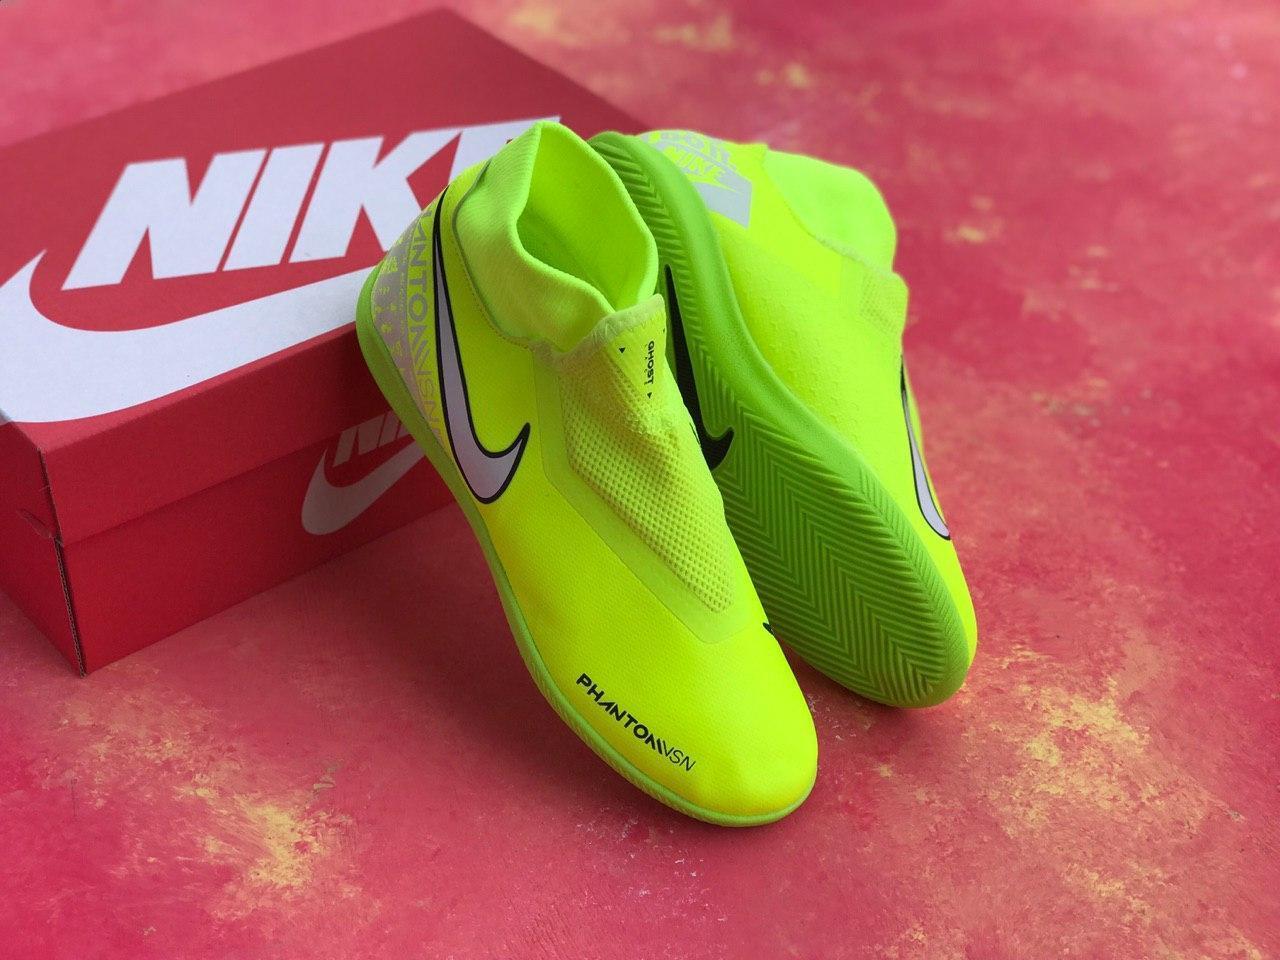 Футзалки лимонные Nike Phantom Vision Academy Dynamic Fit IC футбольная обувь